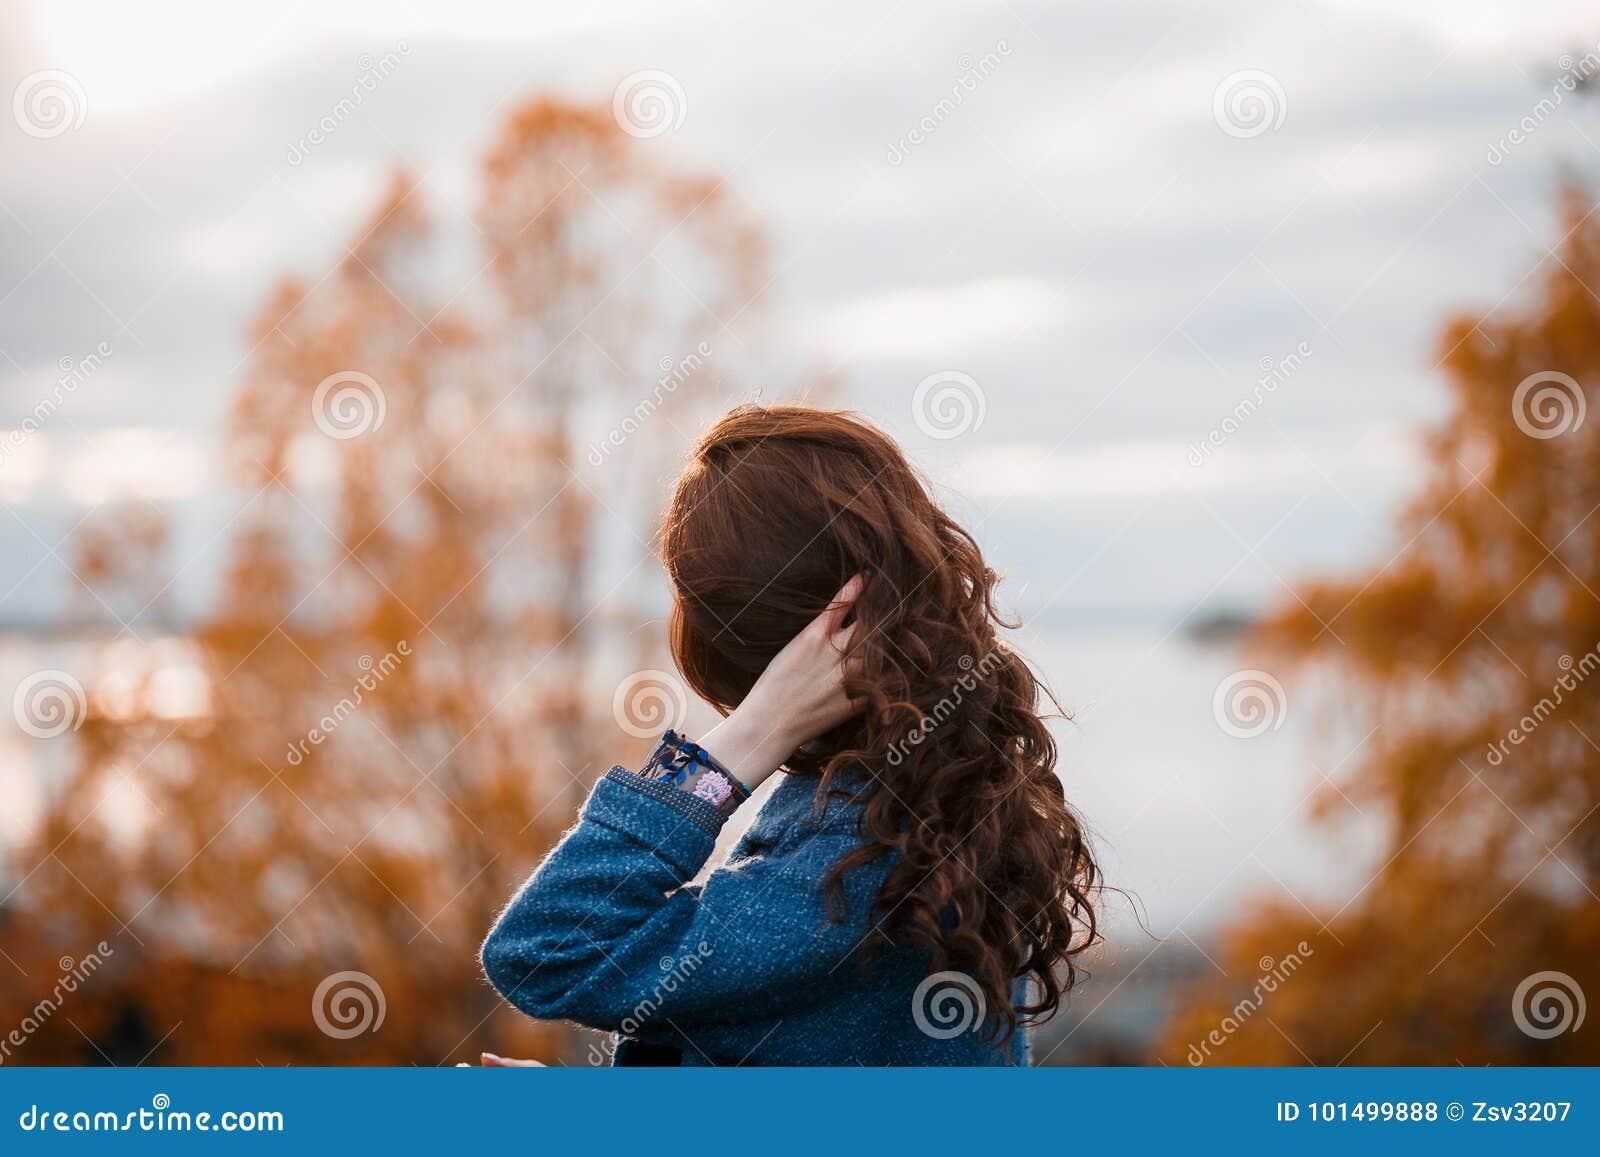 Krullend haar mooi jong Kaukasisch meisje die in openlucht blauwe laag dragen, die in de herfstpark stellen